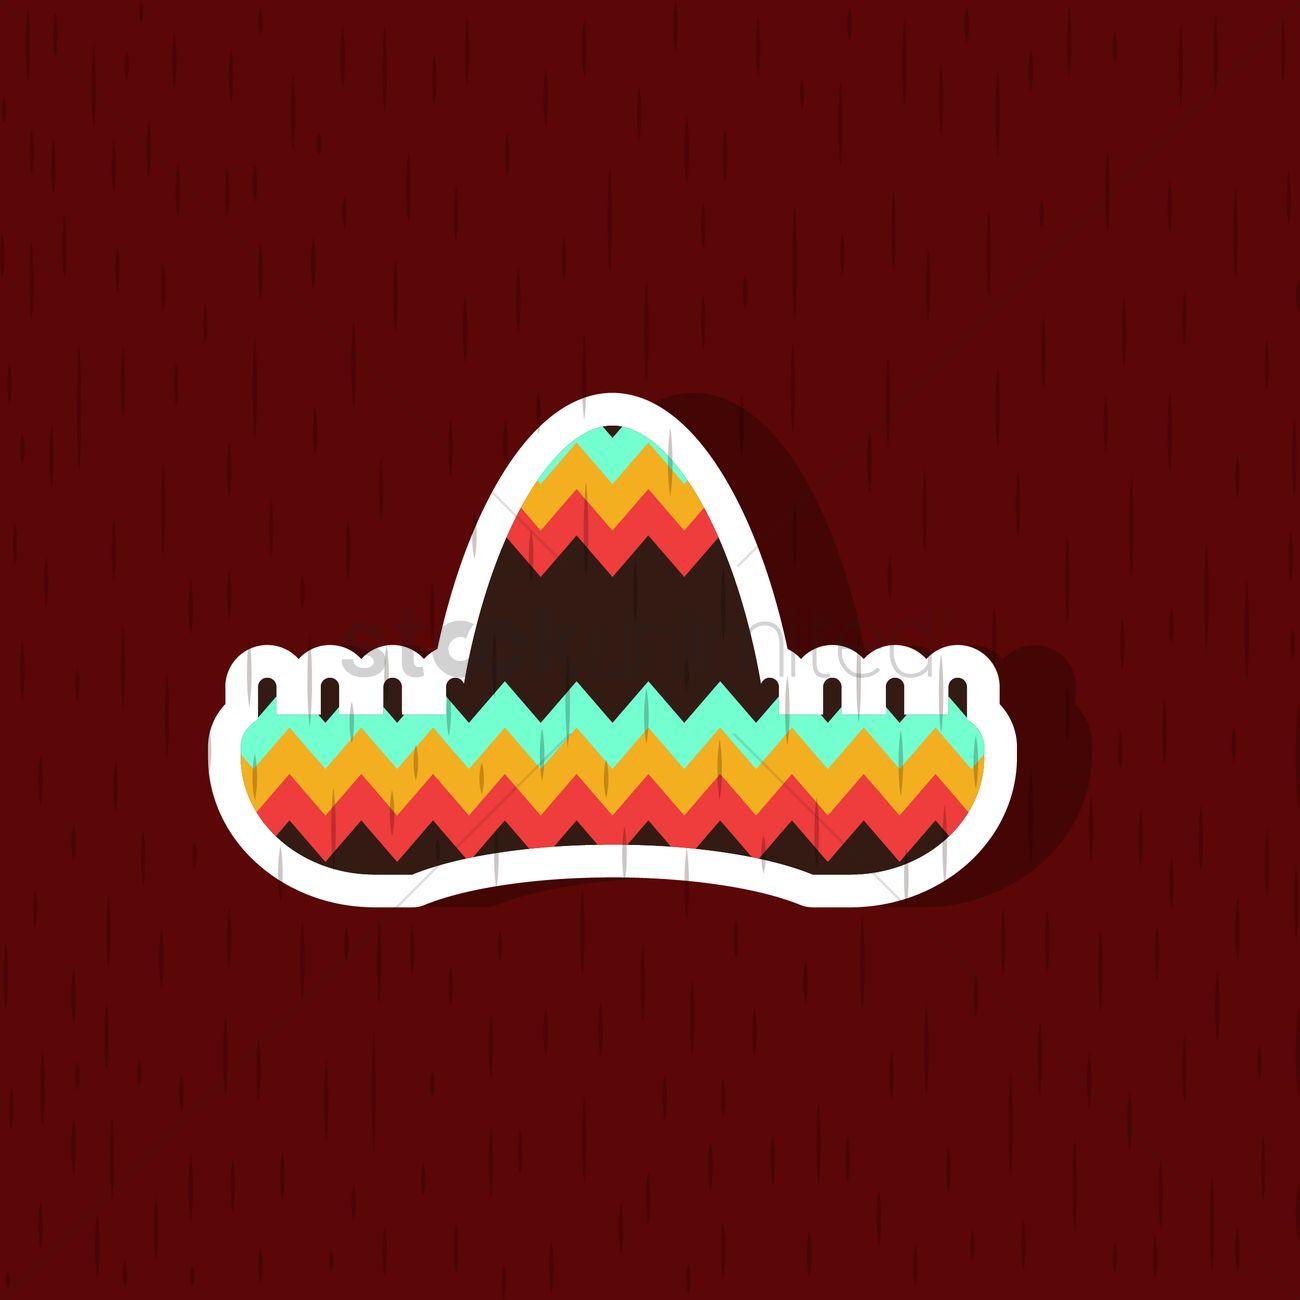 Sombrero hat Vector Image - 2015881 | StockUnlimited